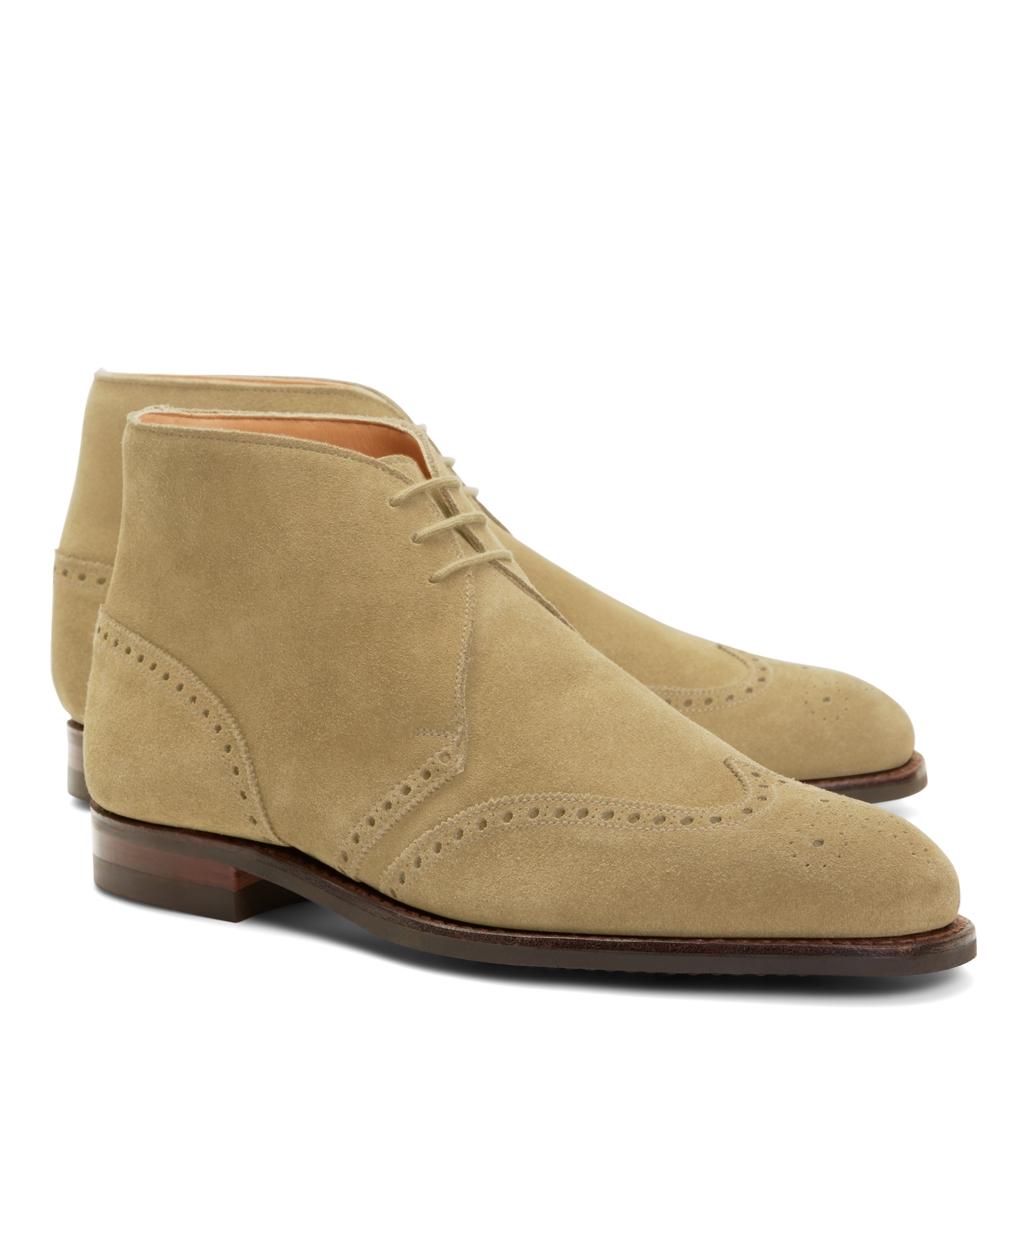 Mens Suede Wingtip Boots Suede Wingtip Boots Brown